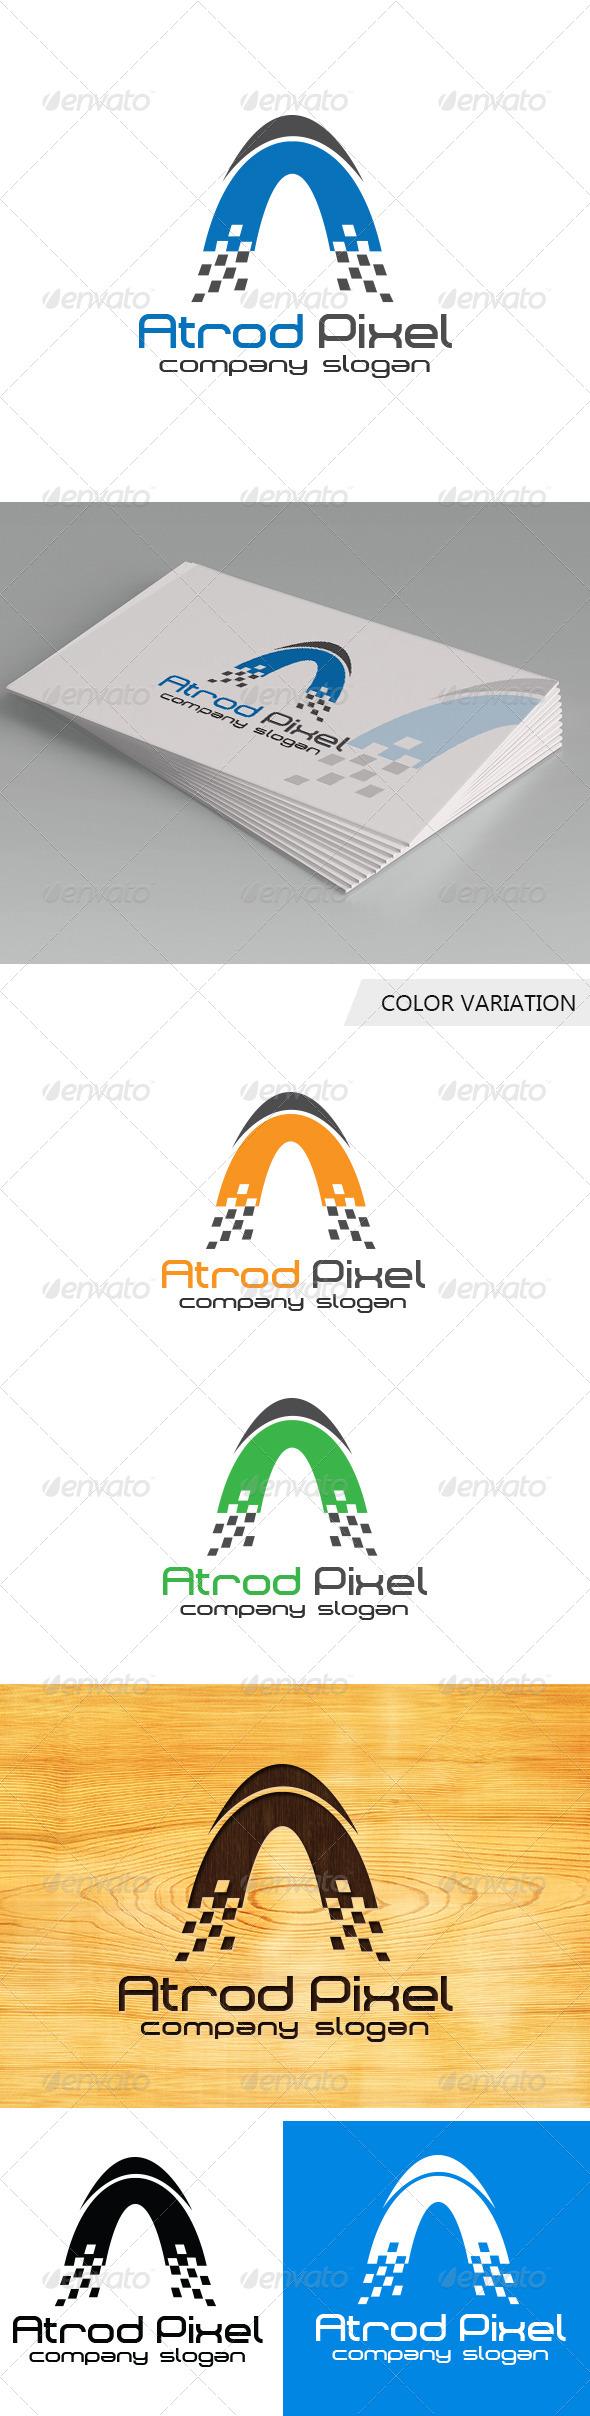 GraphicRiver Atrod Pixel Logo Template 5771954